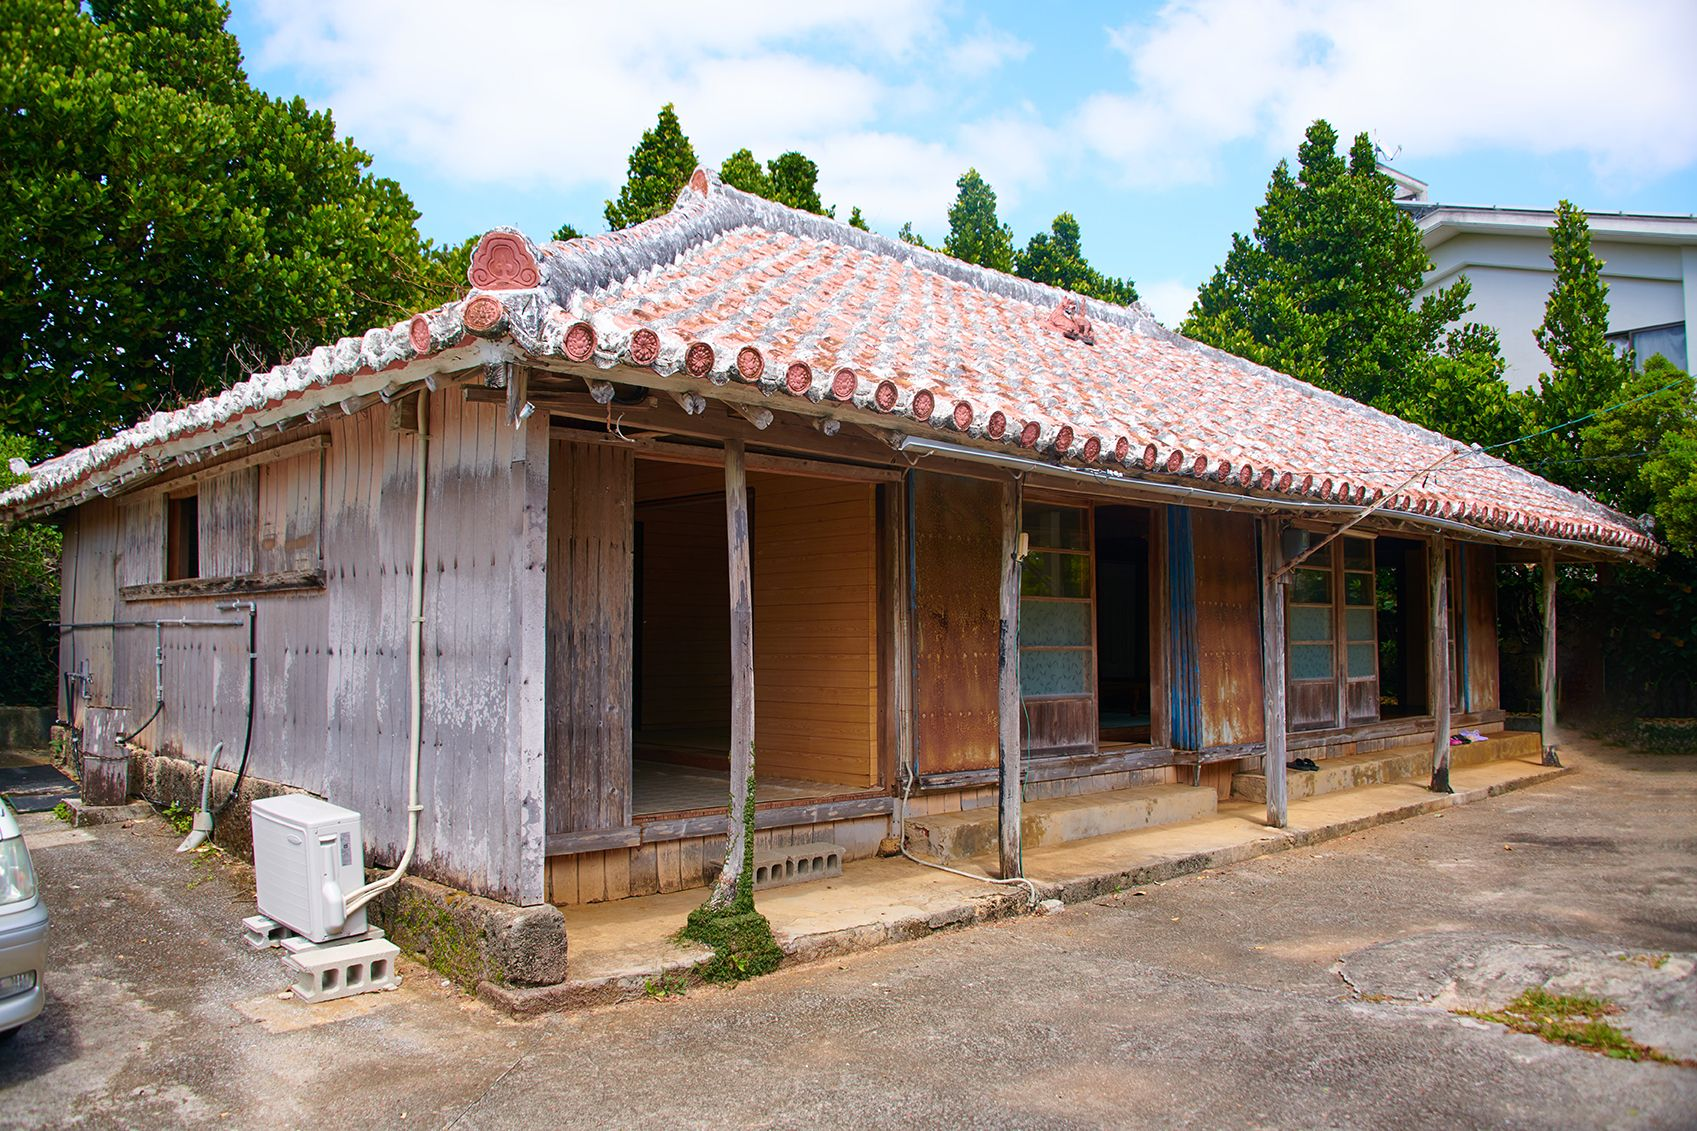 Popular Filming Locations in Okinawa